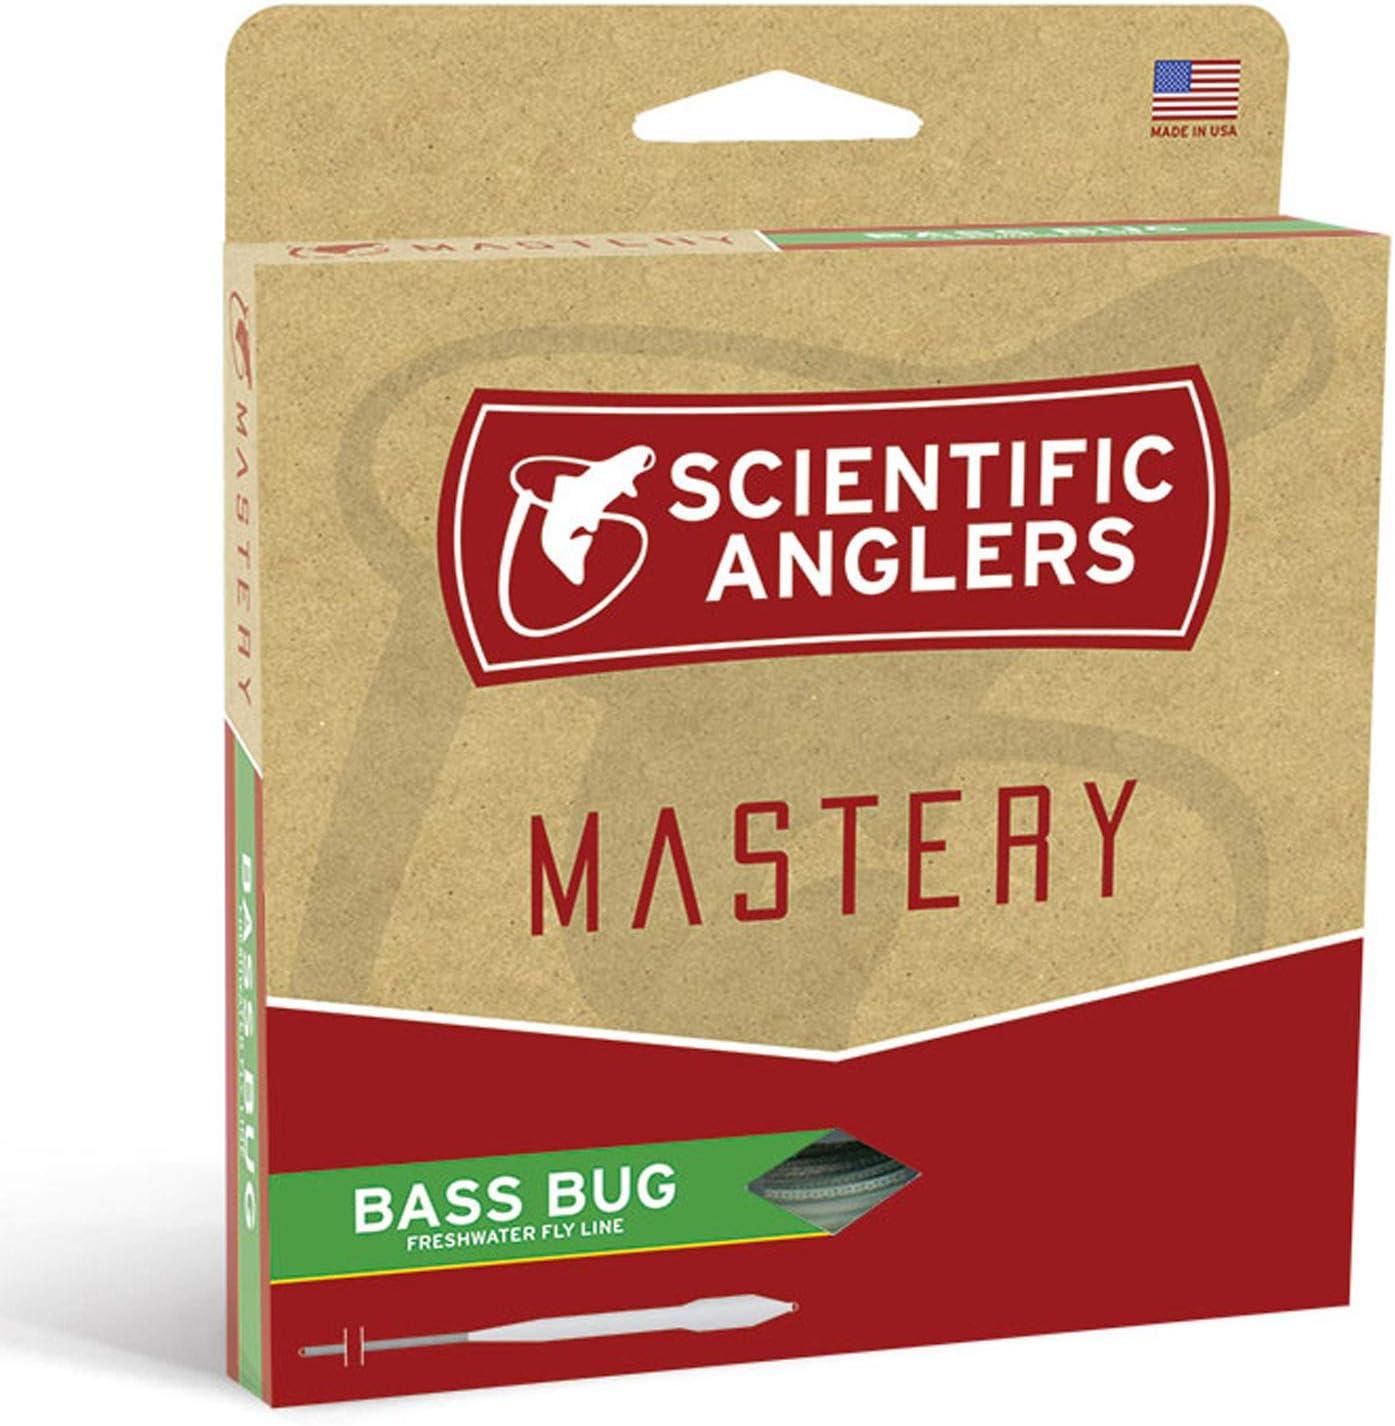 Scientific Anglers Mastery Bass バグテーパー フライライン  WF9F